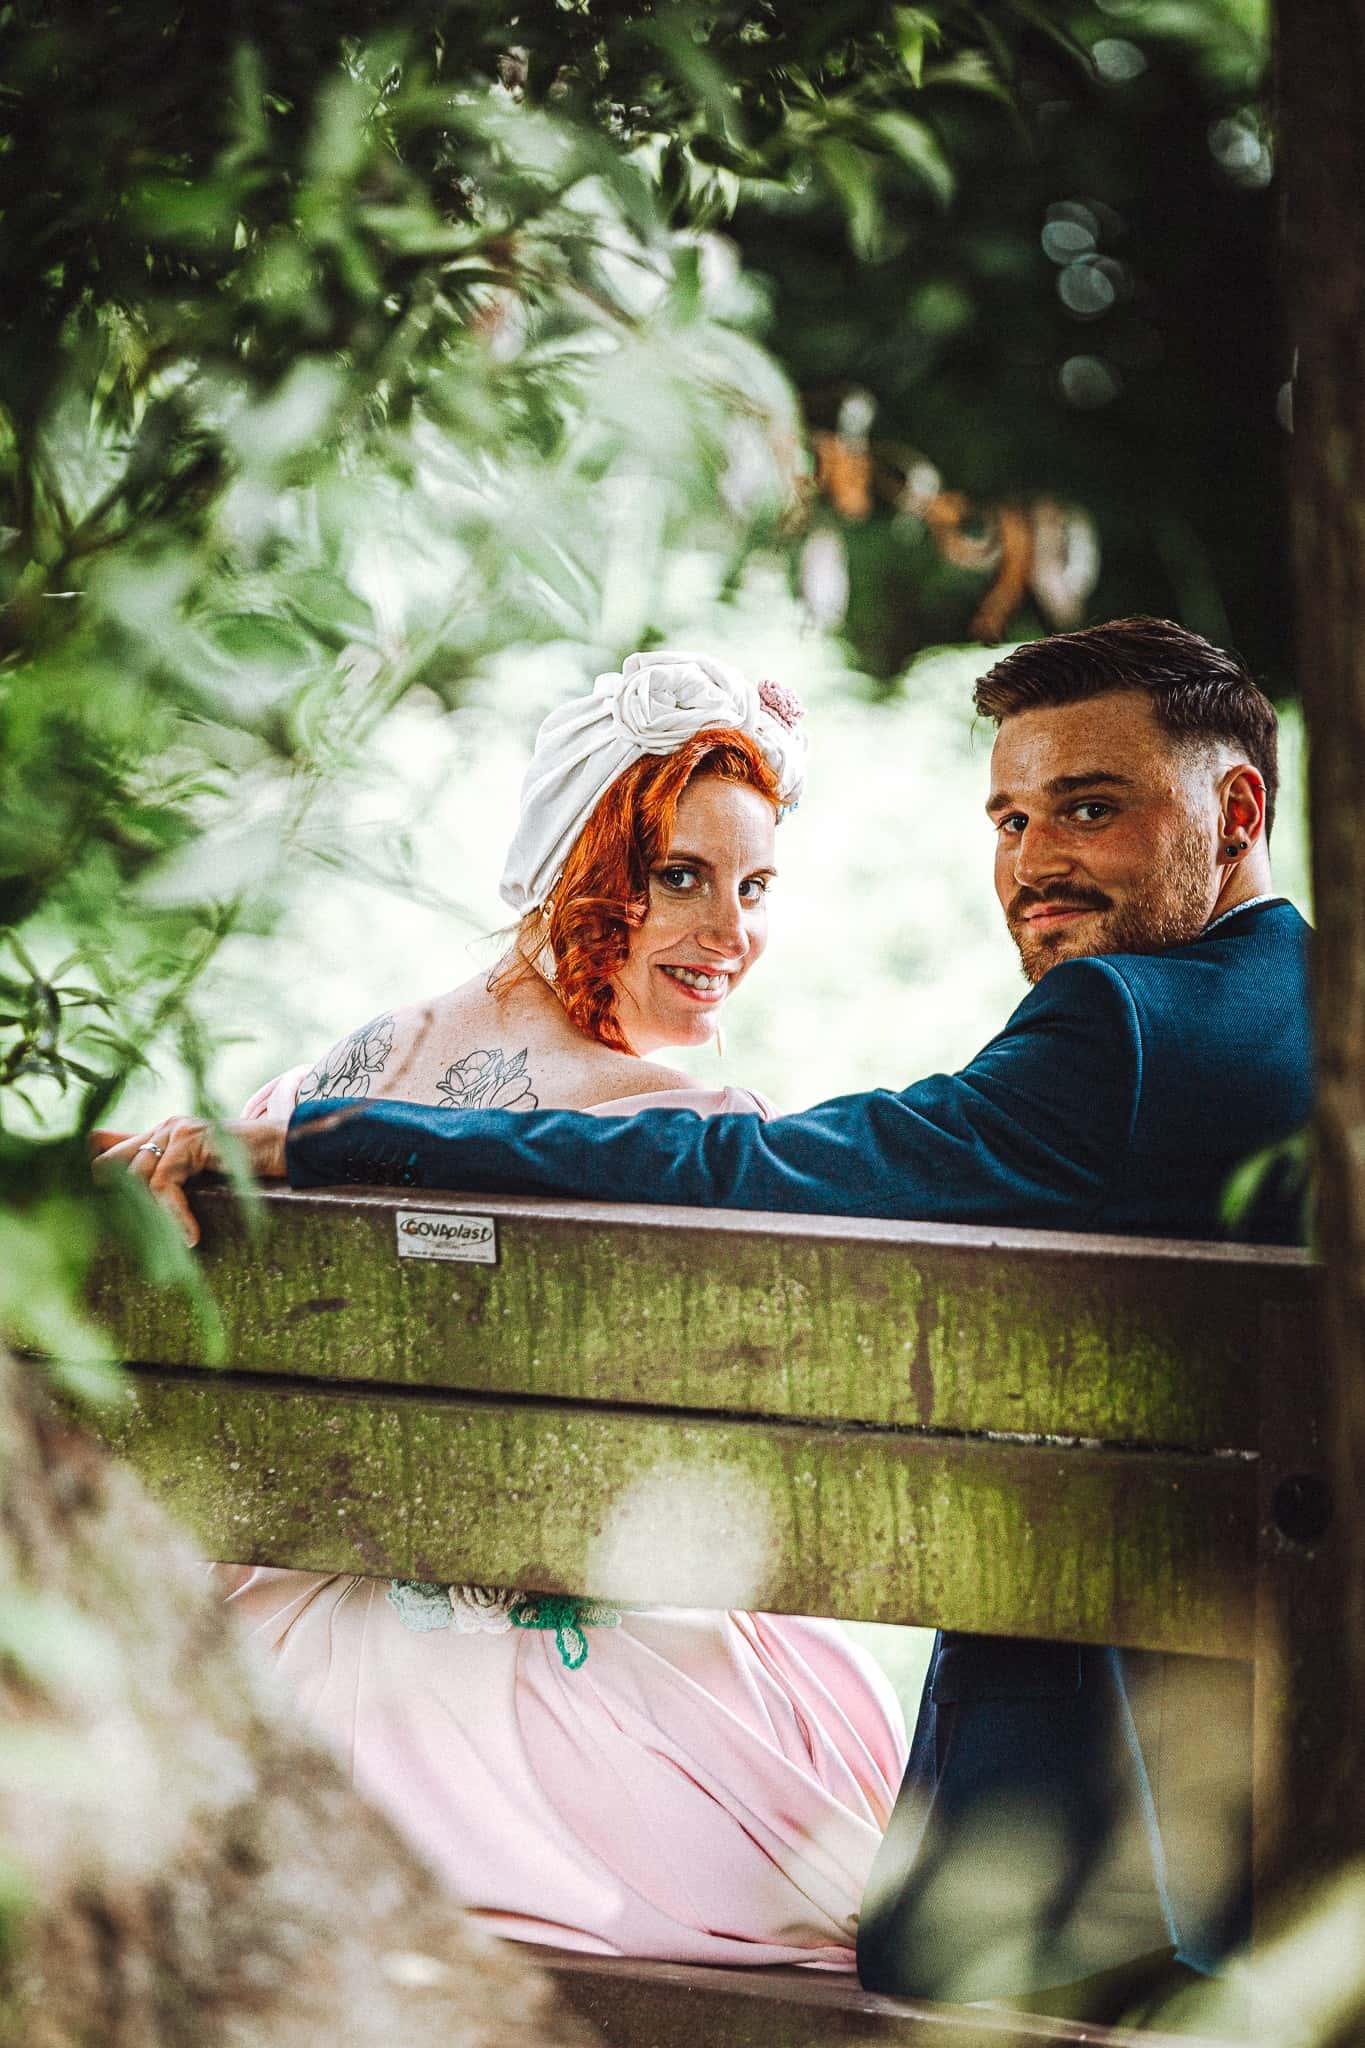 ©photo de mariage STUDIO 7700.BE chez Fhano - https://www.7700.be